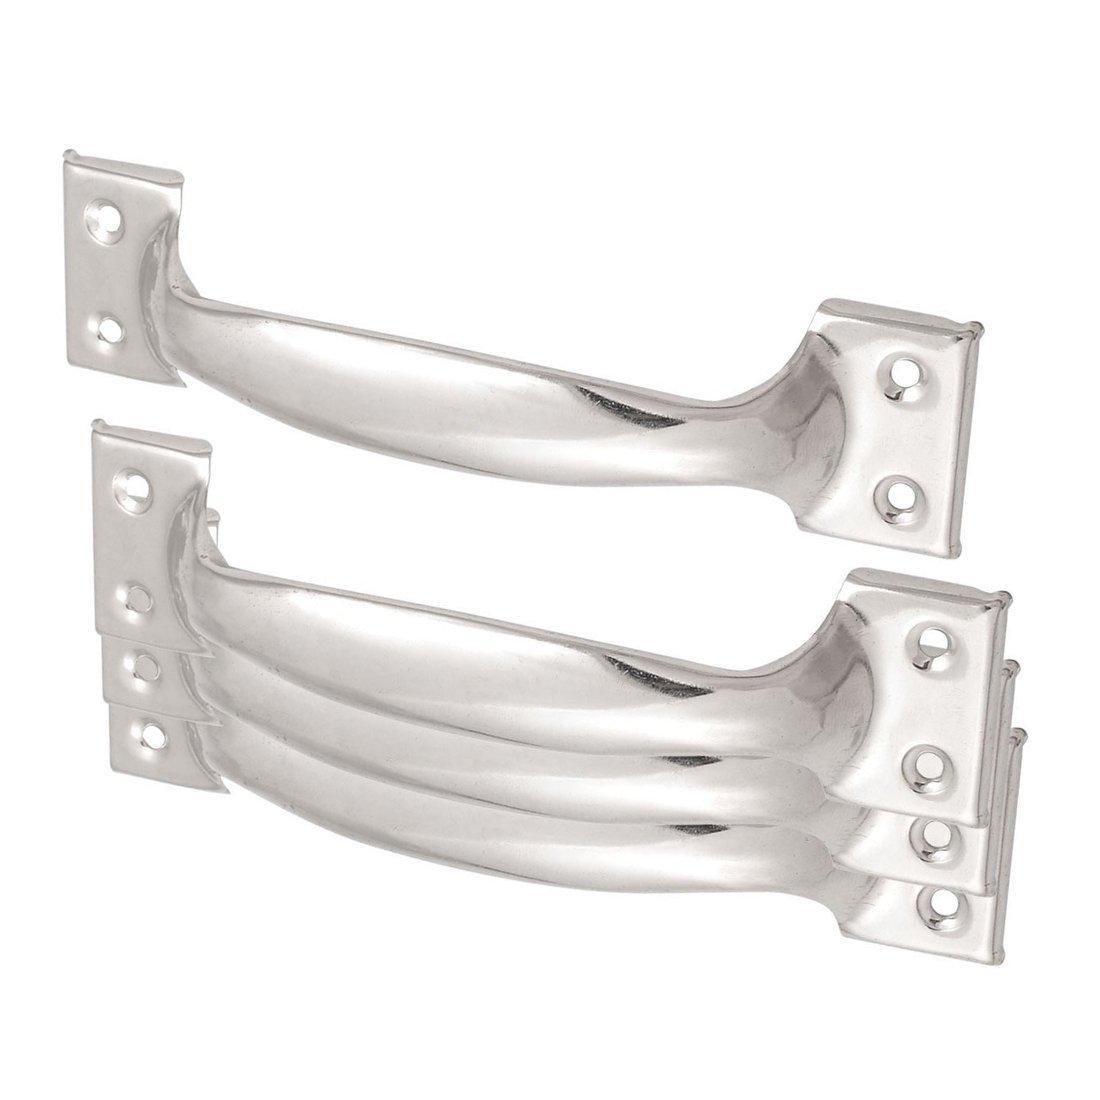 R Door Handles 4 Pcs Silver Tone Arched Cabinet Door Pull Handles 6 Length SODIAL